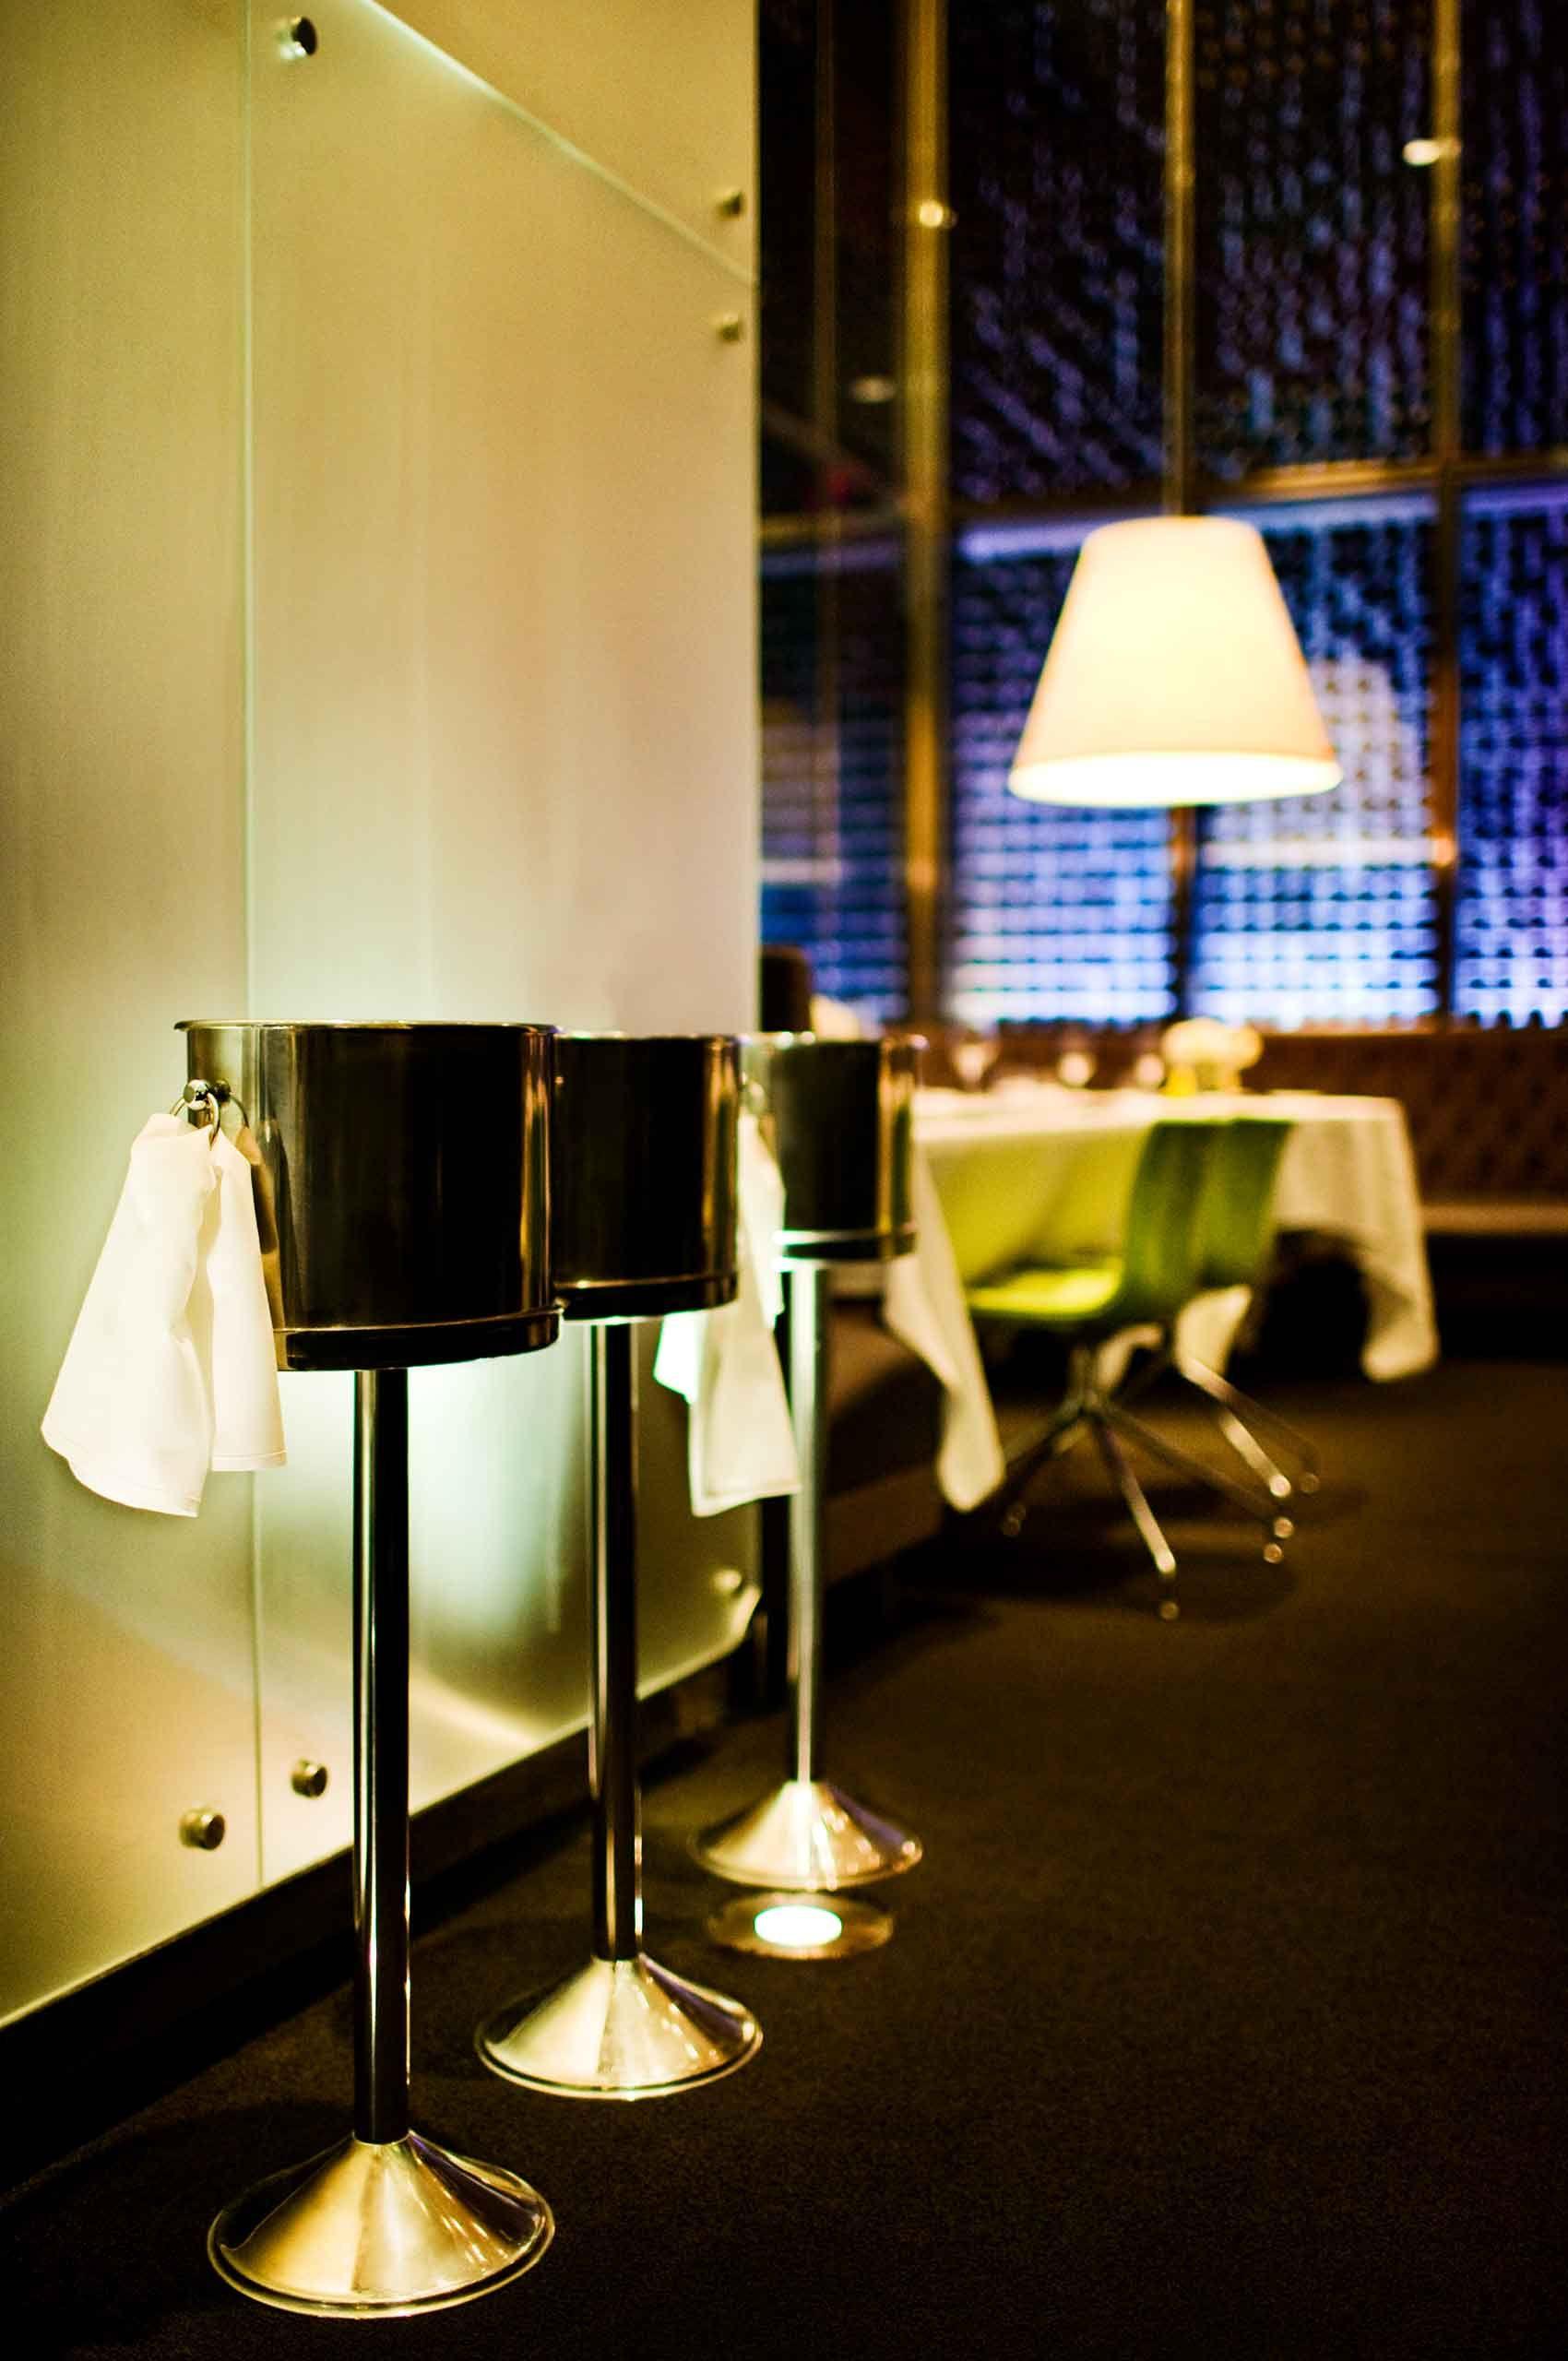 Champagne-bucket-Alto-NewYorkRestaurants-by-HenrikOlundPhotography.jpg